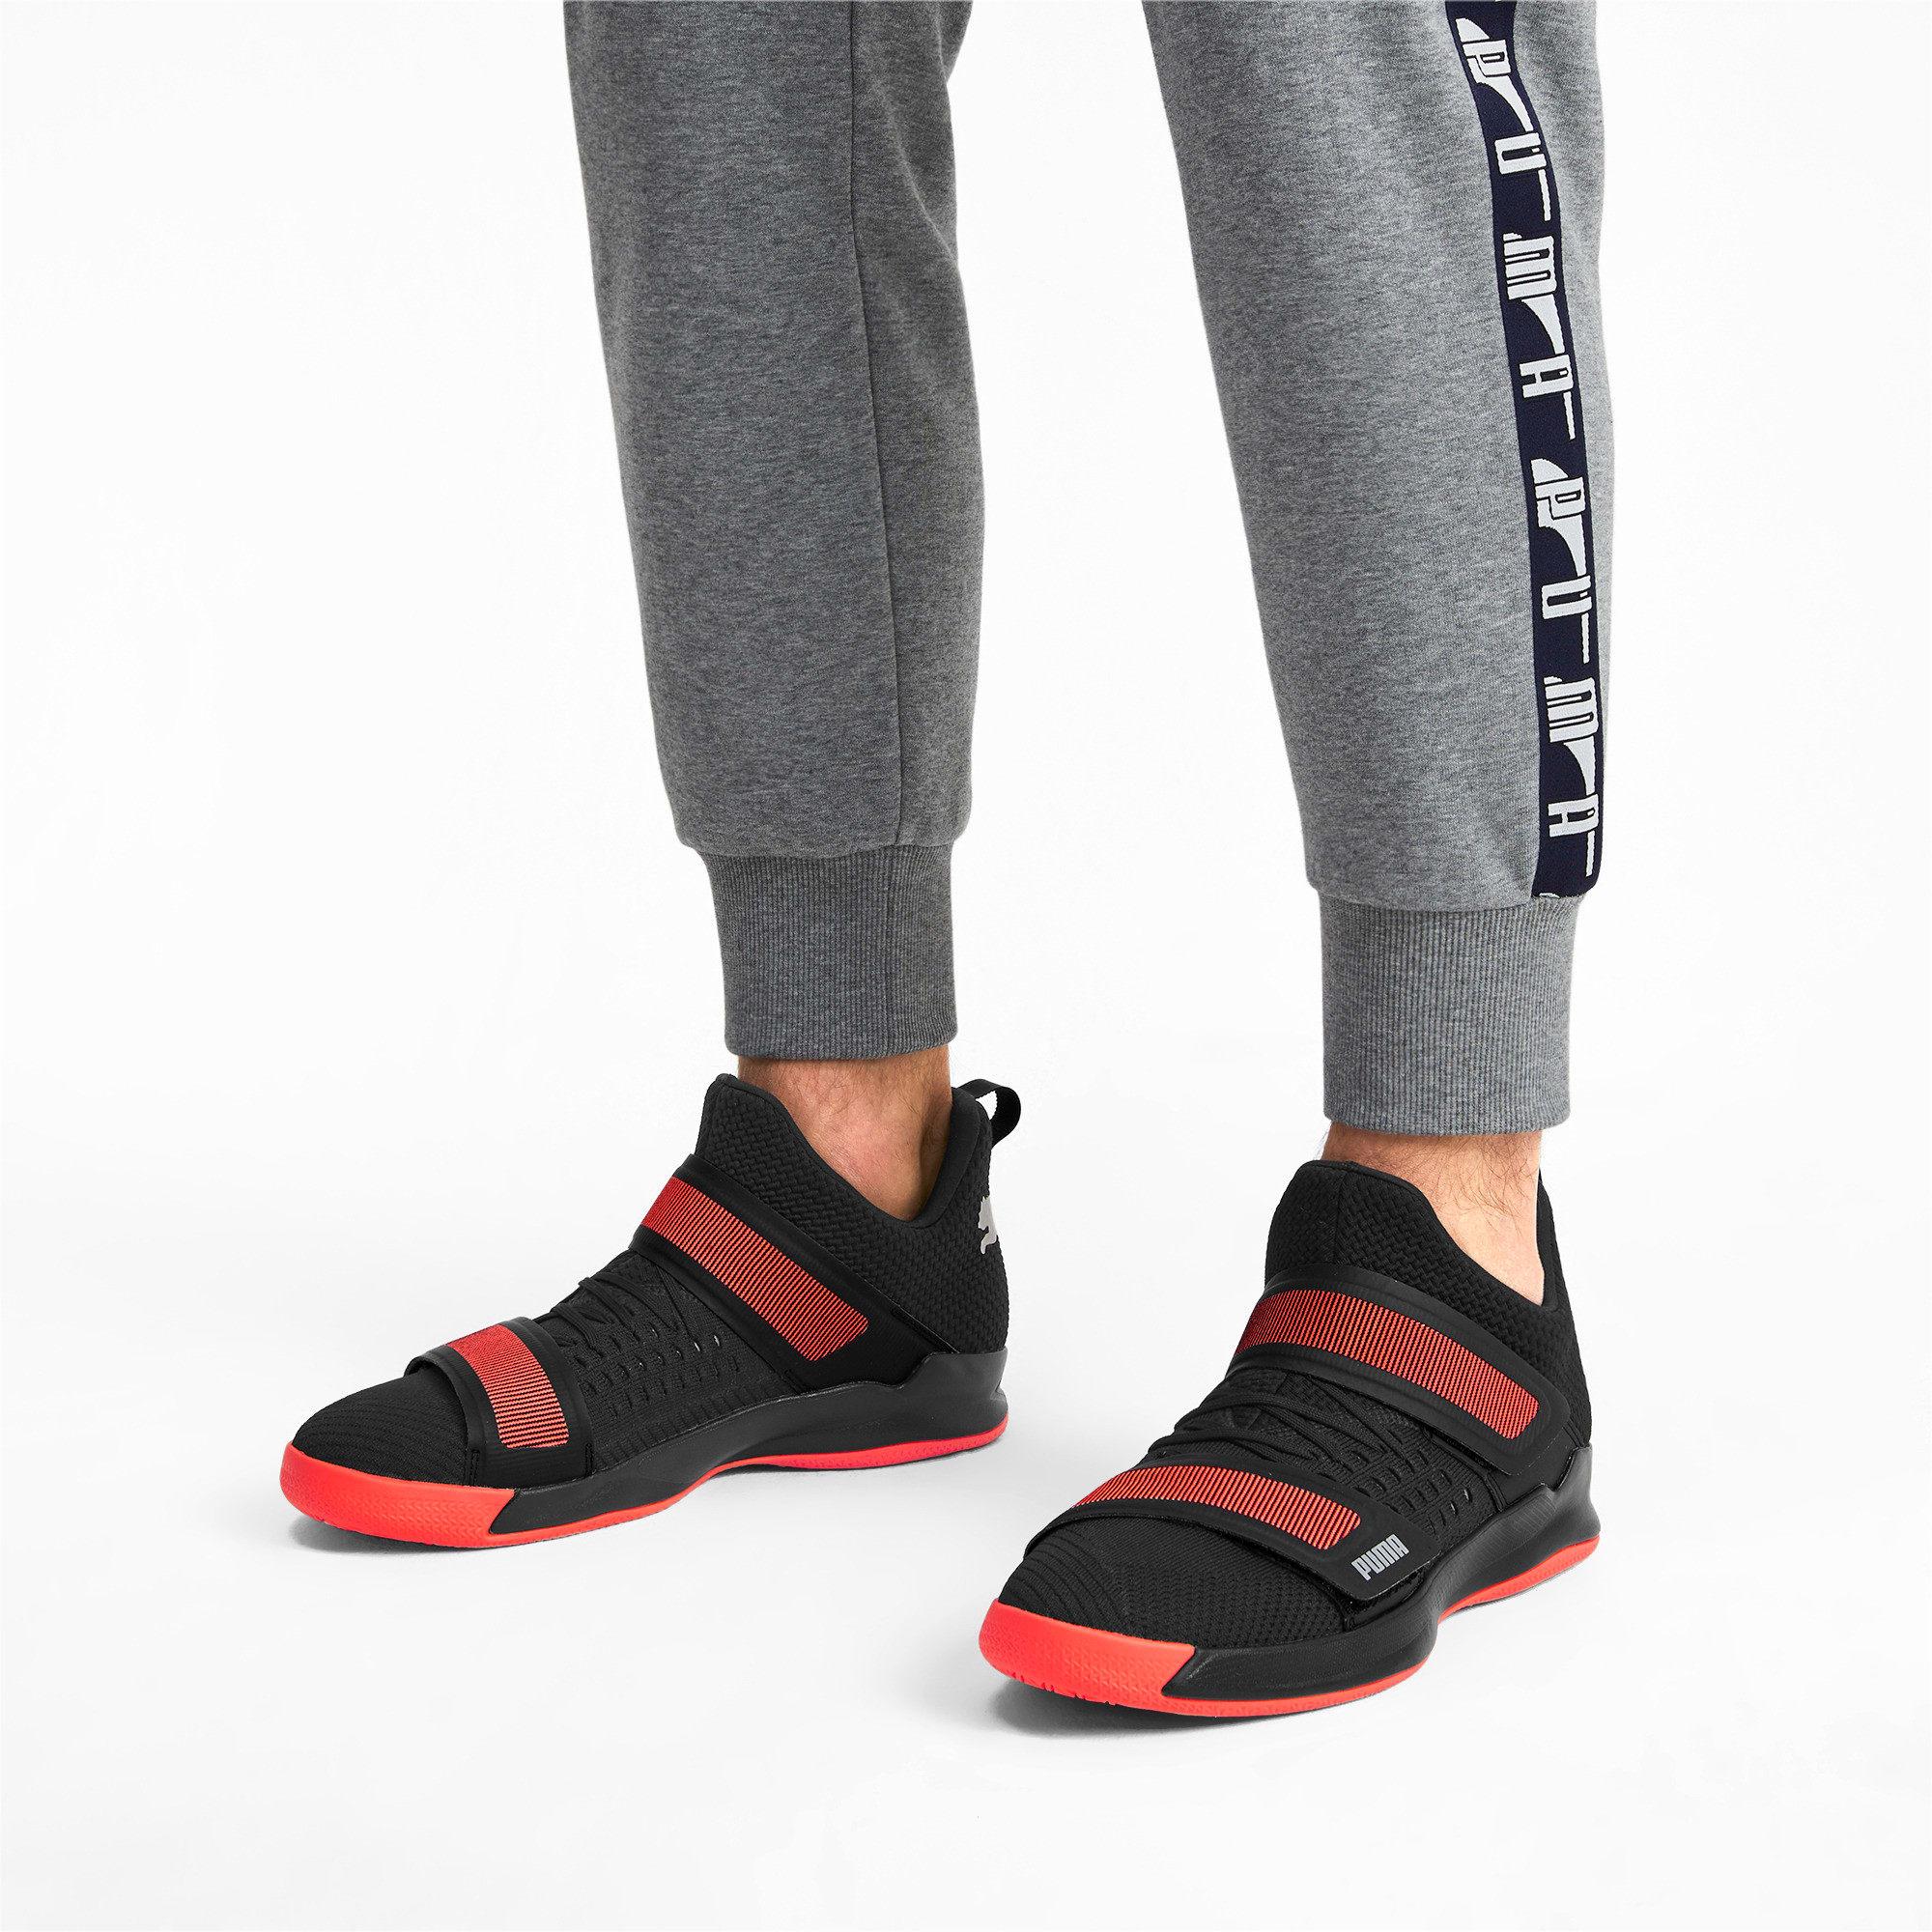 Thumbnail 2 of Rise XT3 NETFIT Handball Shoes, Puma Black-Silver-Nrgy Red, medium